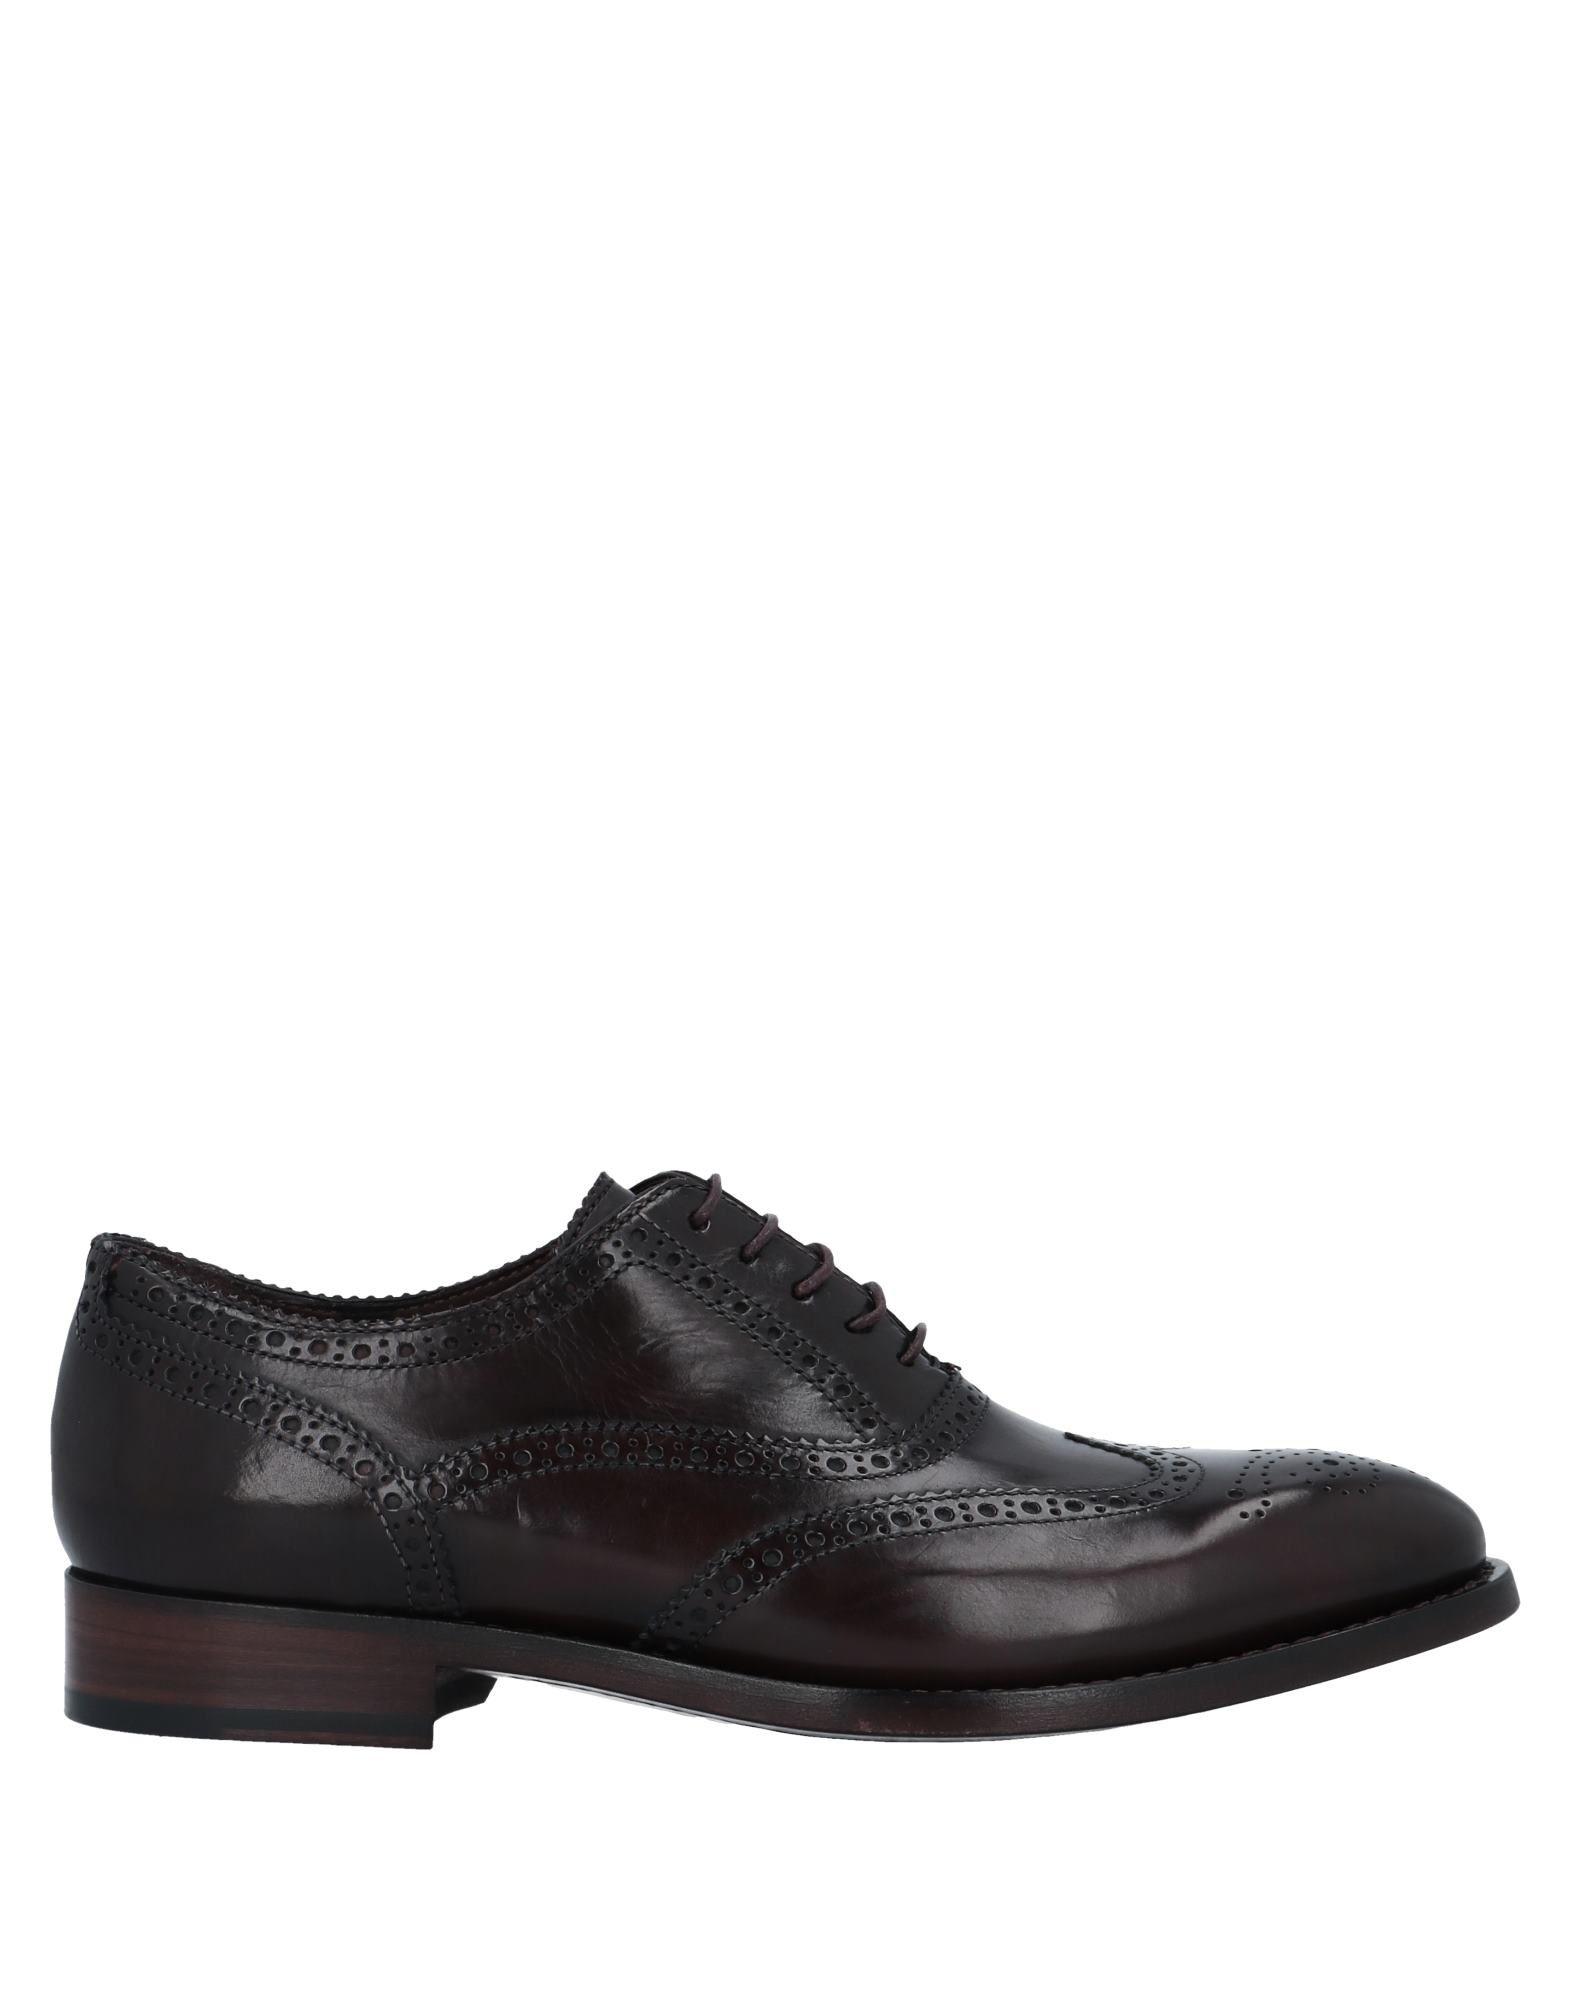 все цены на PAUL SMITH Обувь на шнурках онлайн